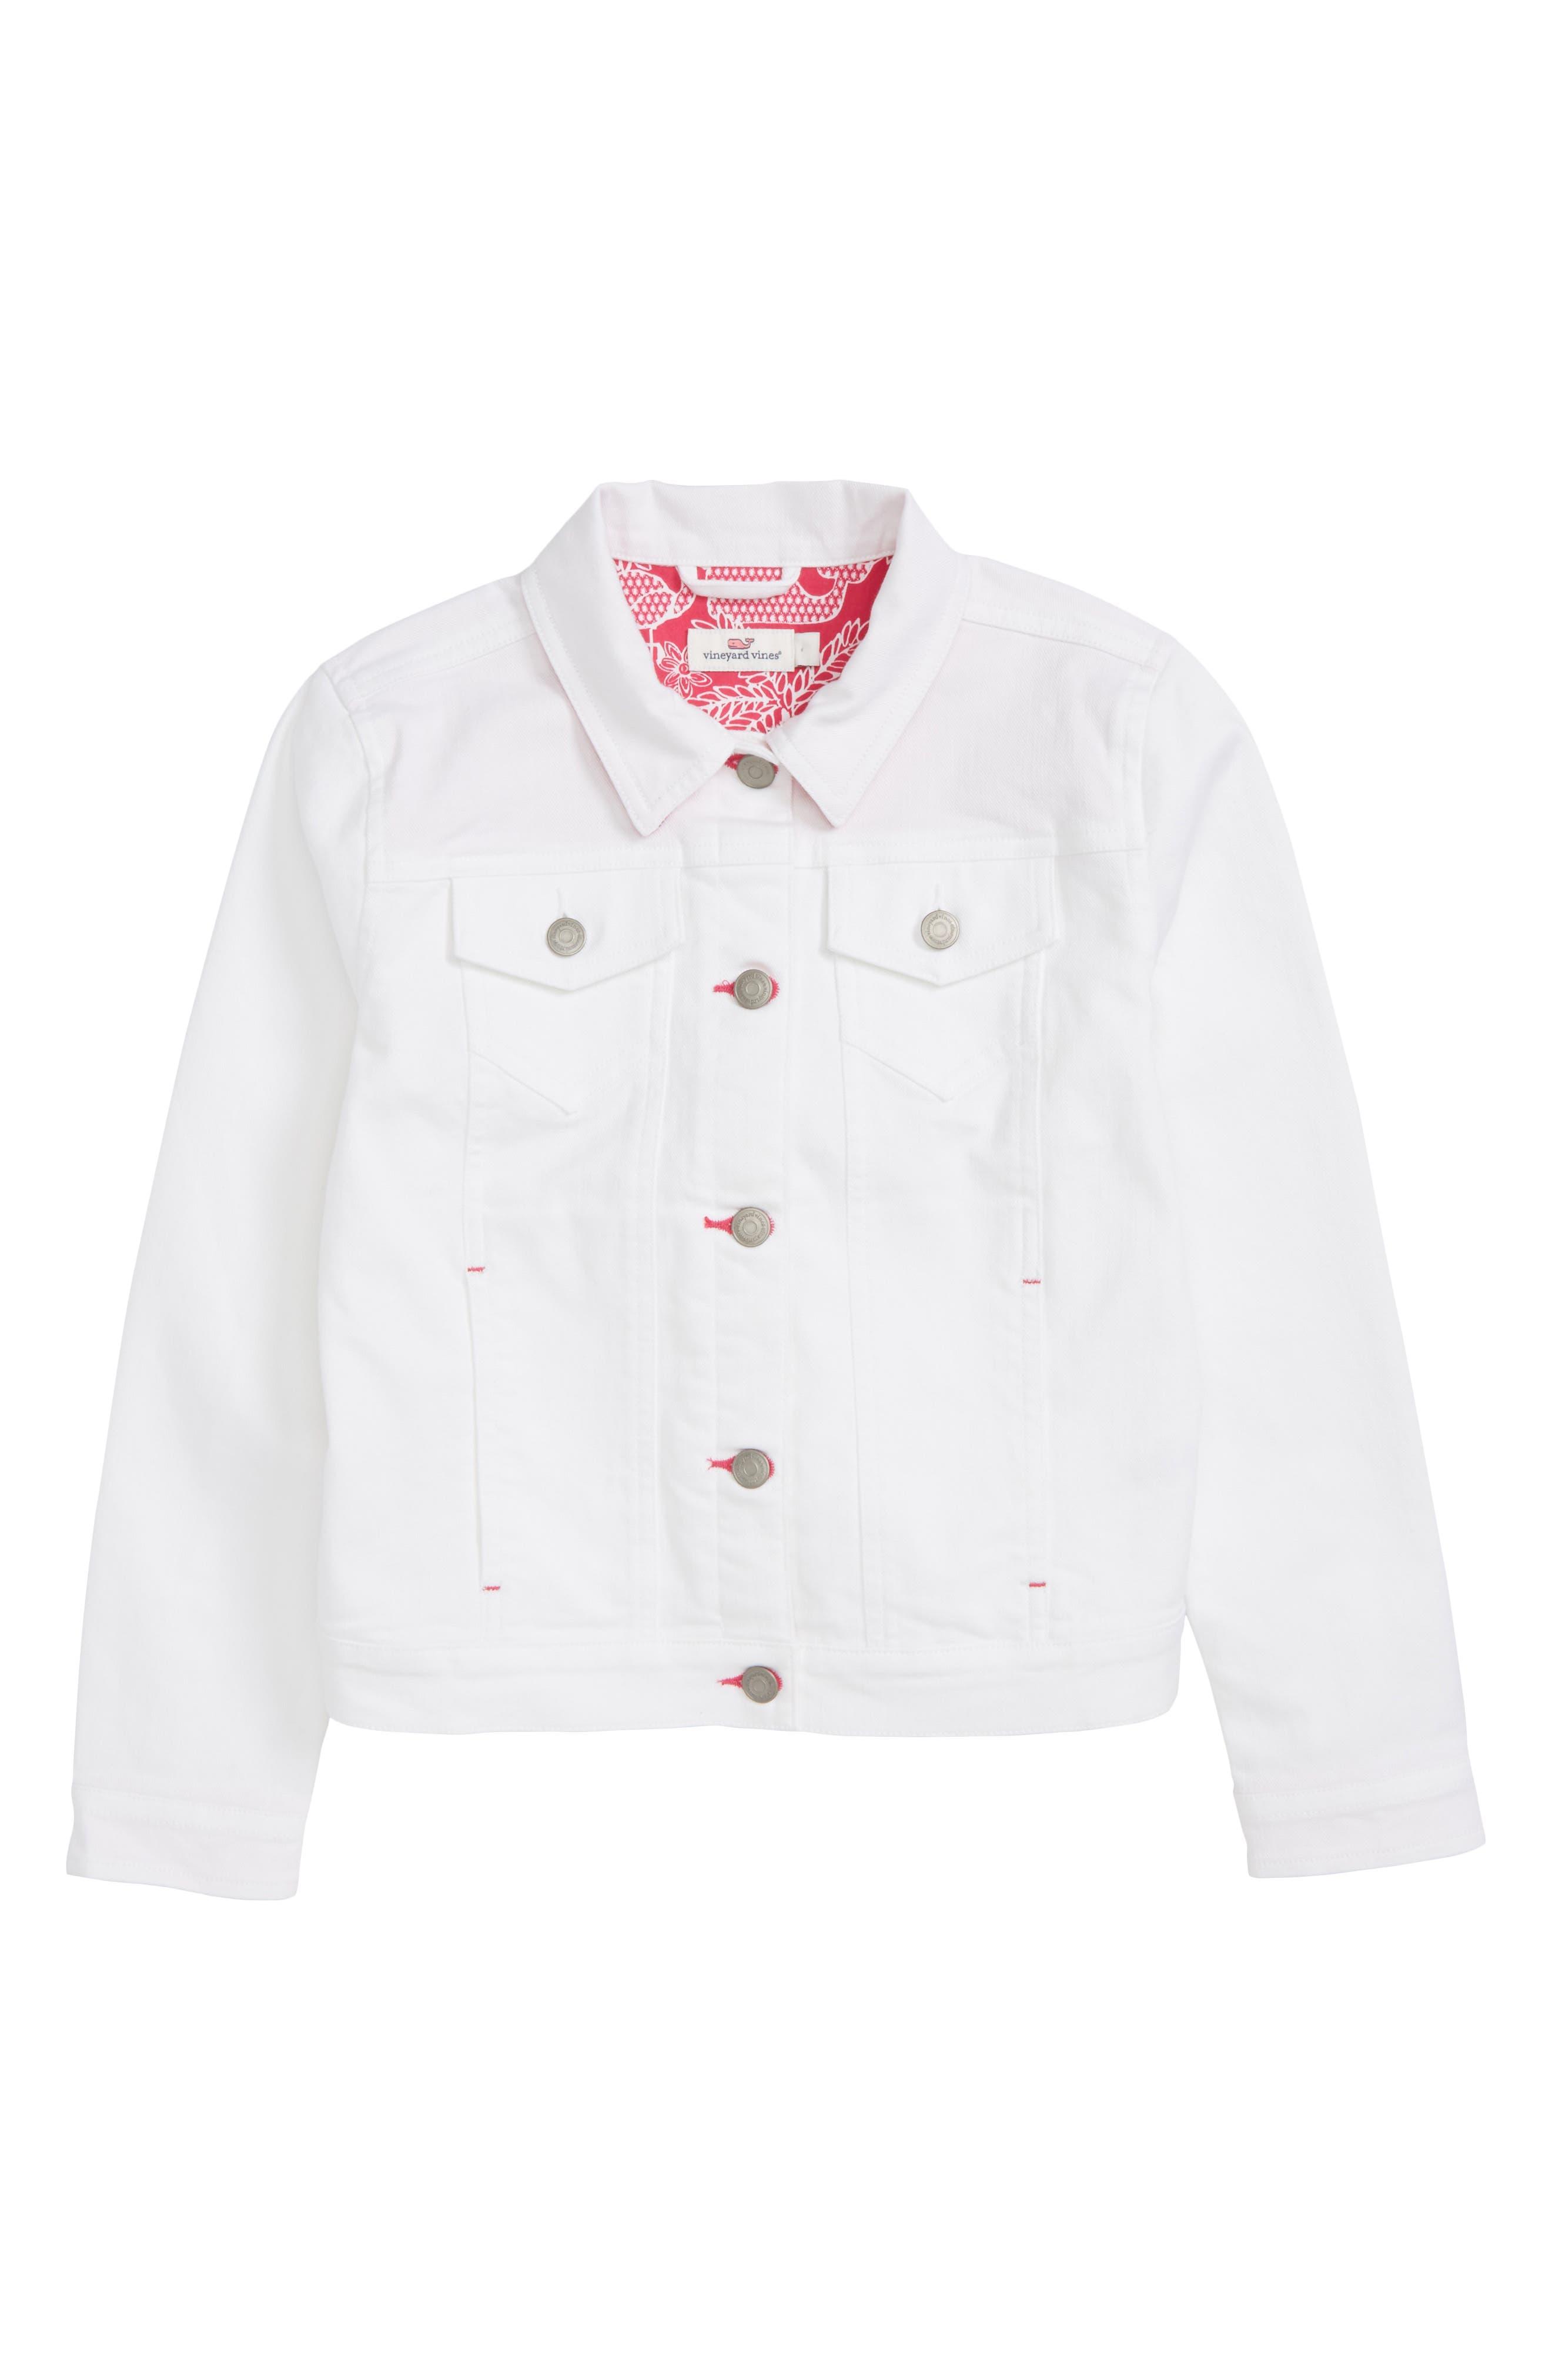 White Denim Jacket,                         Main,                         color, White Cap